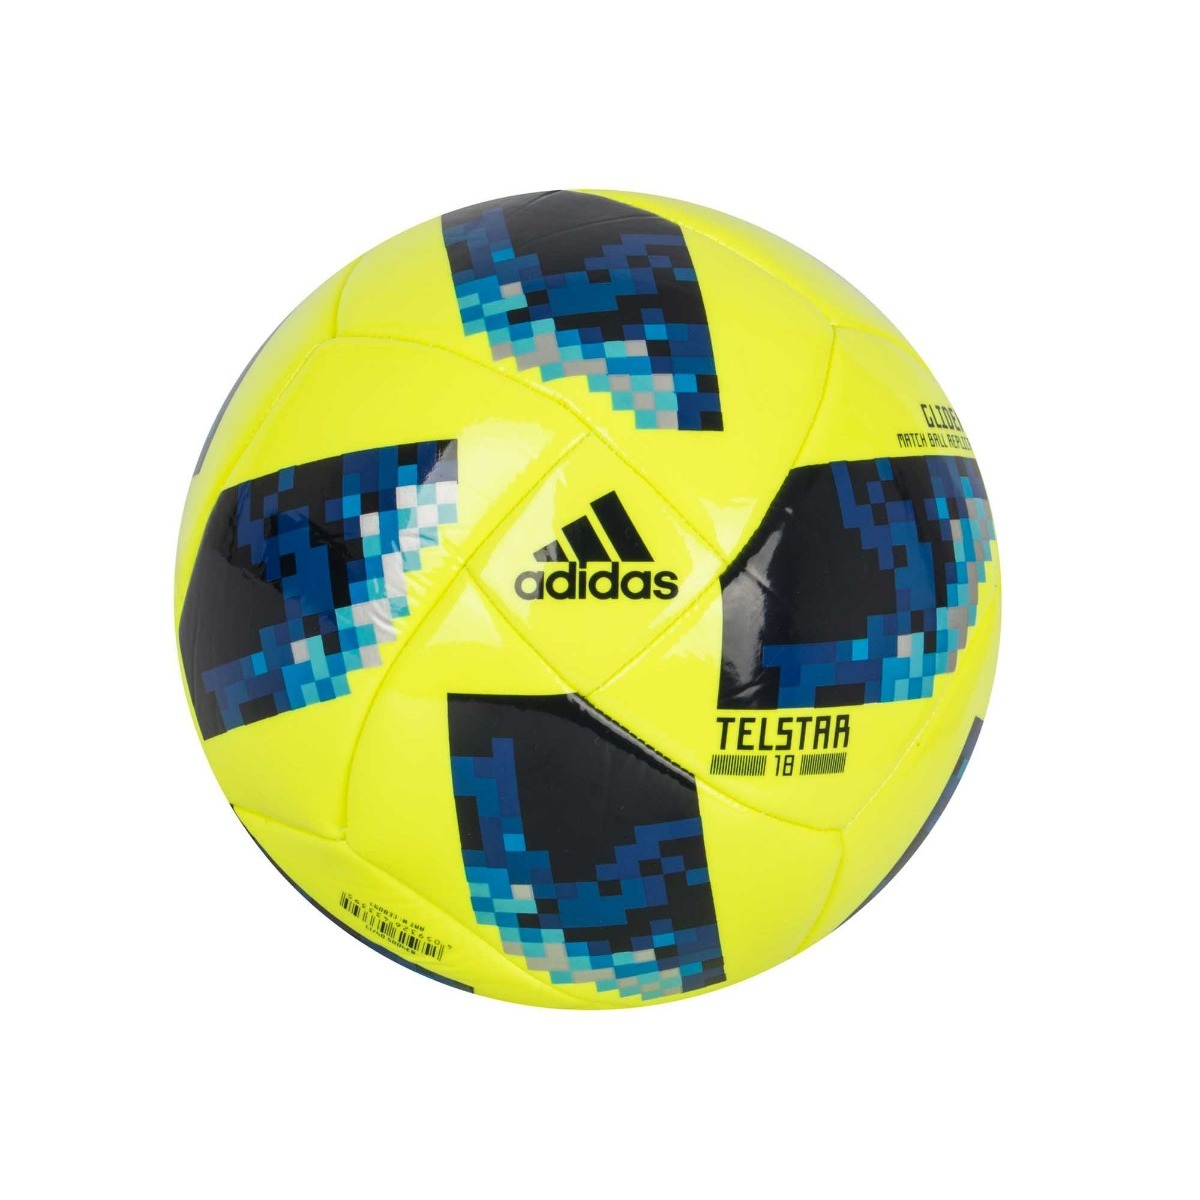 Balón adidas Del No.5 Modelo Telstar Amarillo (hegol) -   599.00 en ... a2cbf89b97128